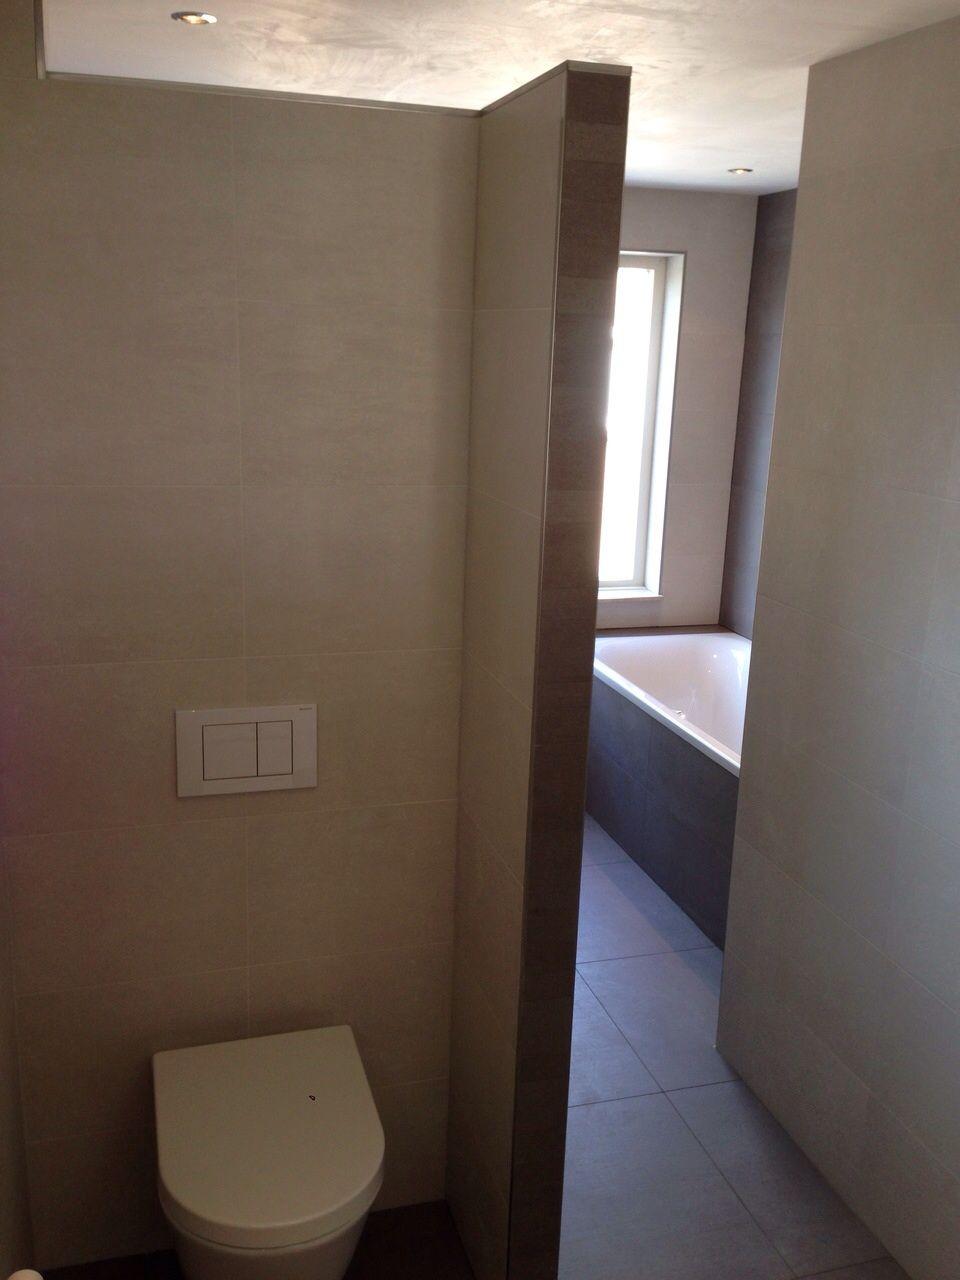 Gerealiseerde badkamer met stucplafond door Sanidrome Fleming in ...